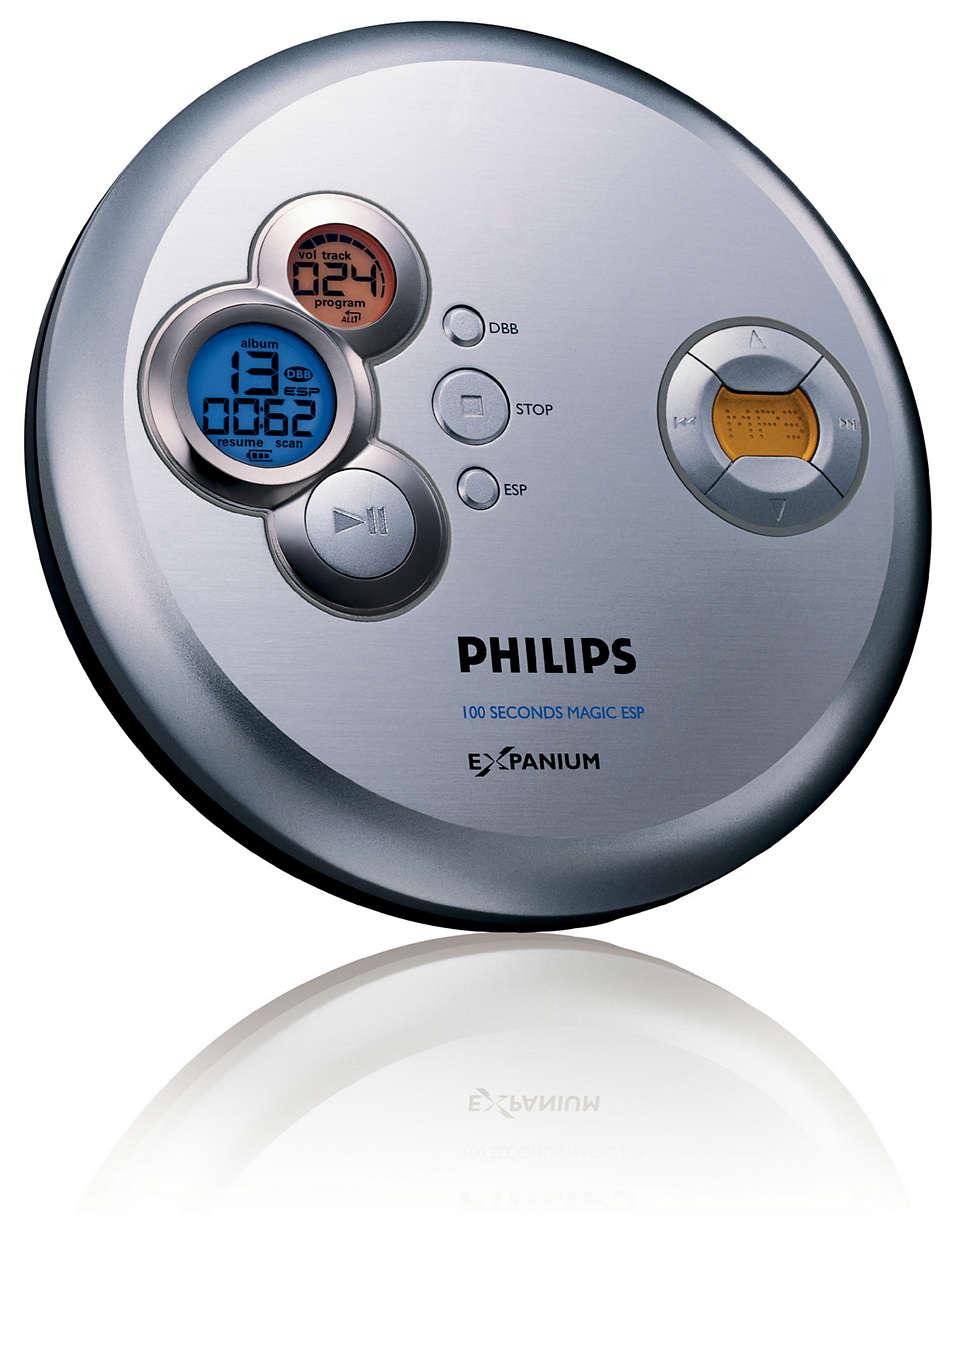 Musica MP3 senza interruzioni